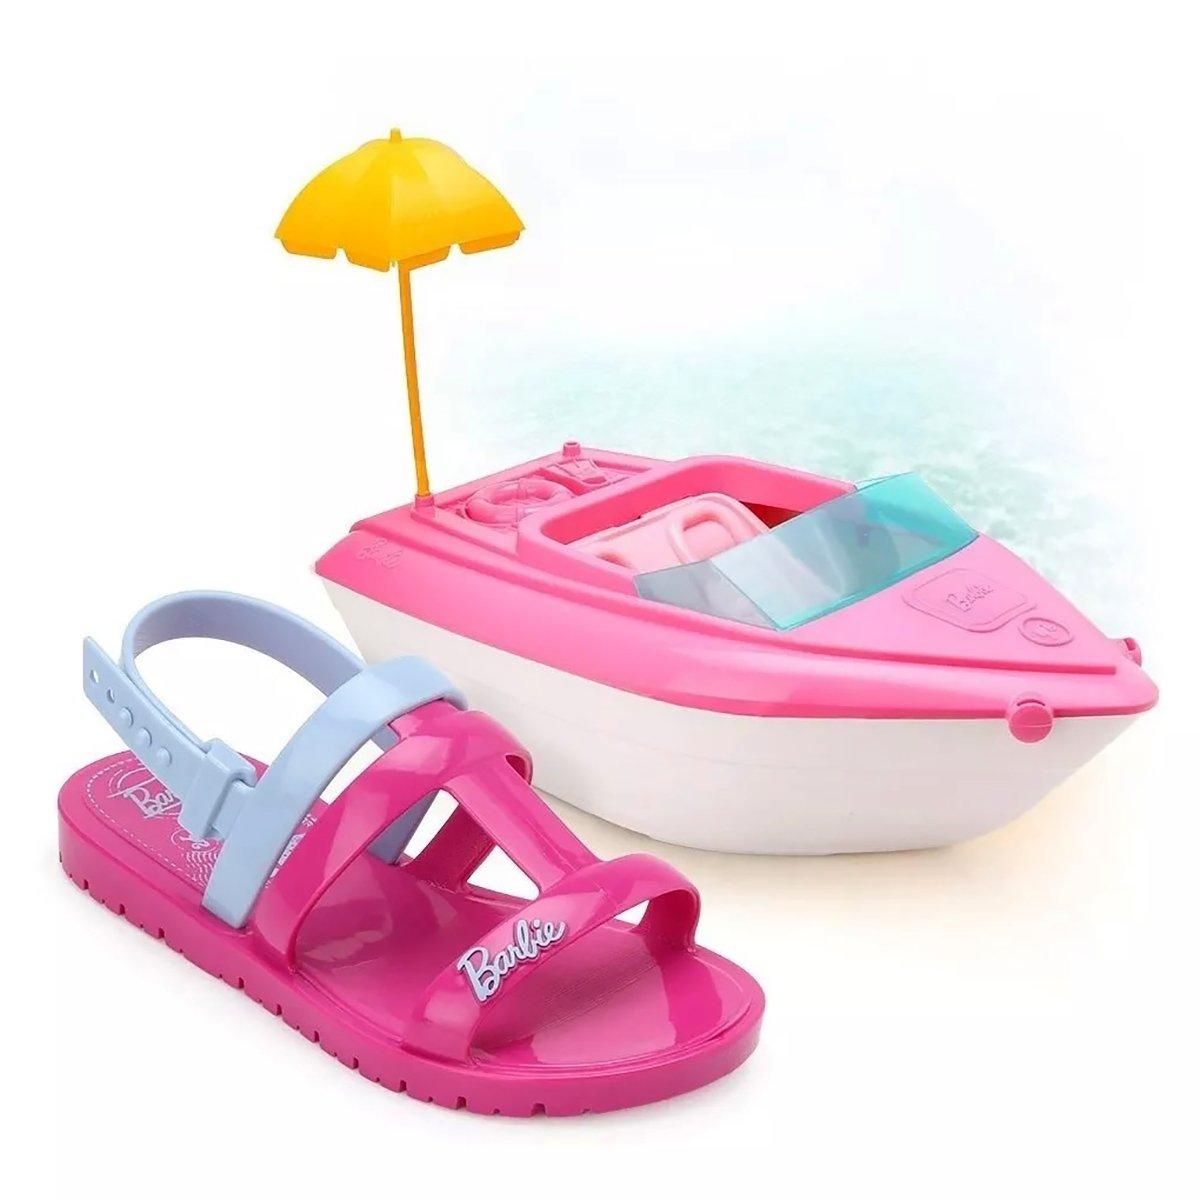 Sandália Barbie Iate Grendene Infantil - Rosa e Azul